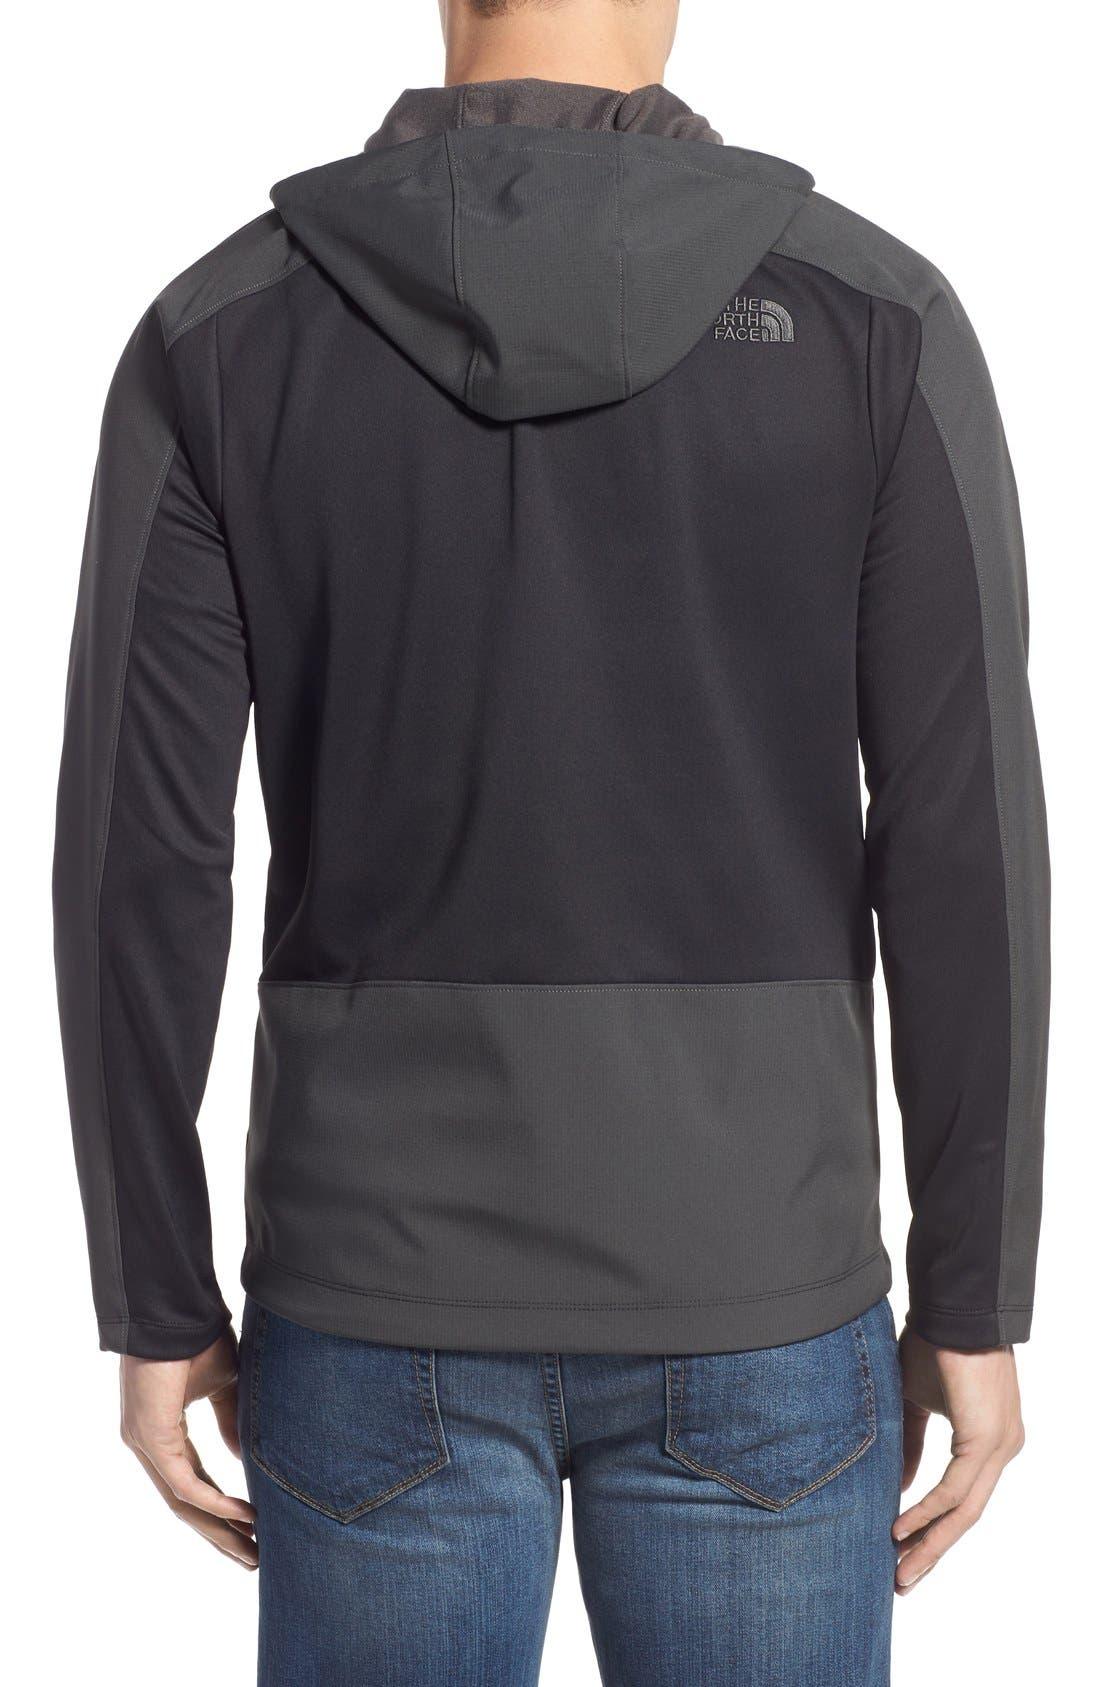 Tenacious Active Fit Hooded Jacket,                             Alternate thumbnail 2, color,                             010